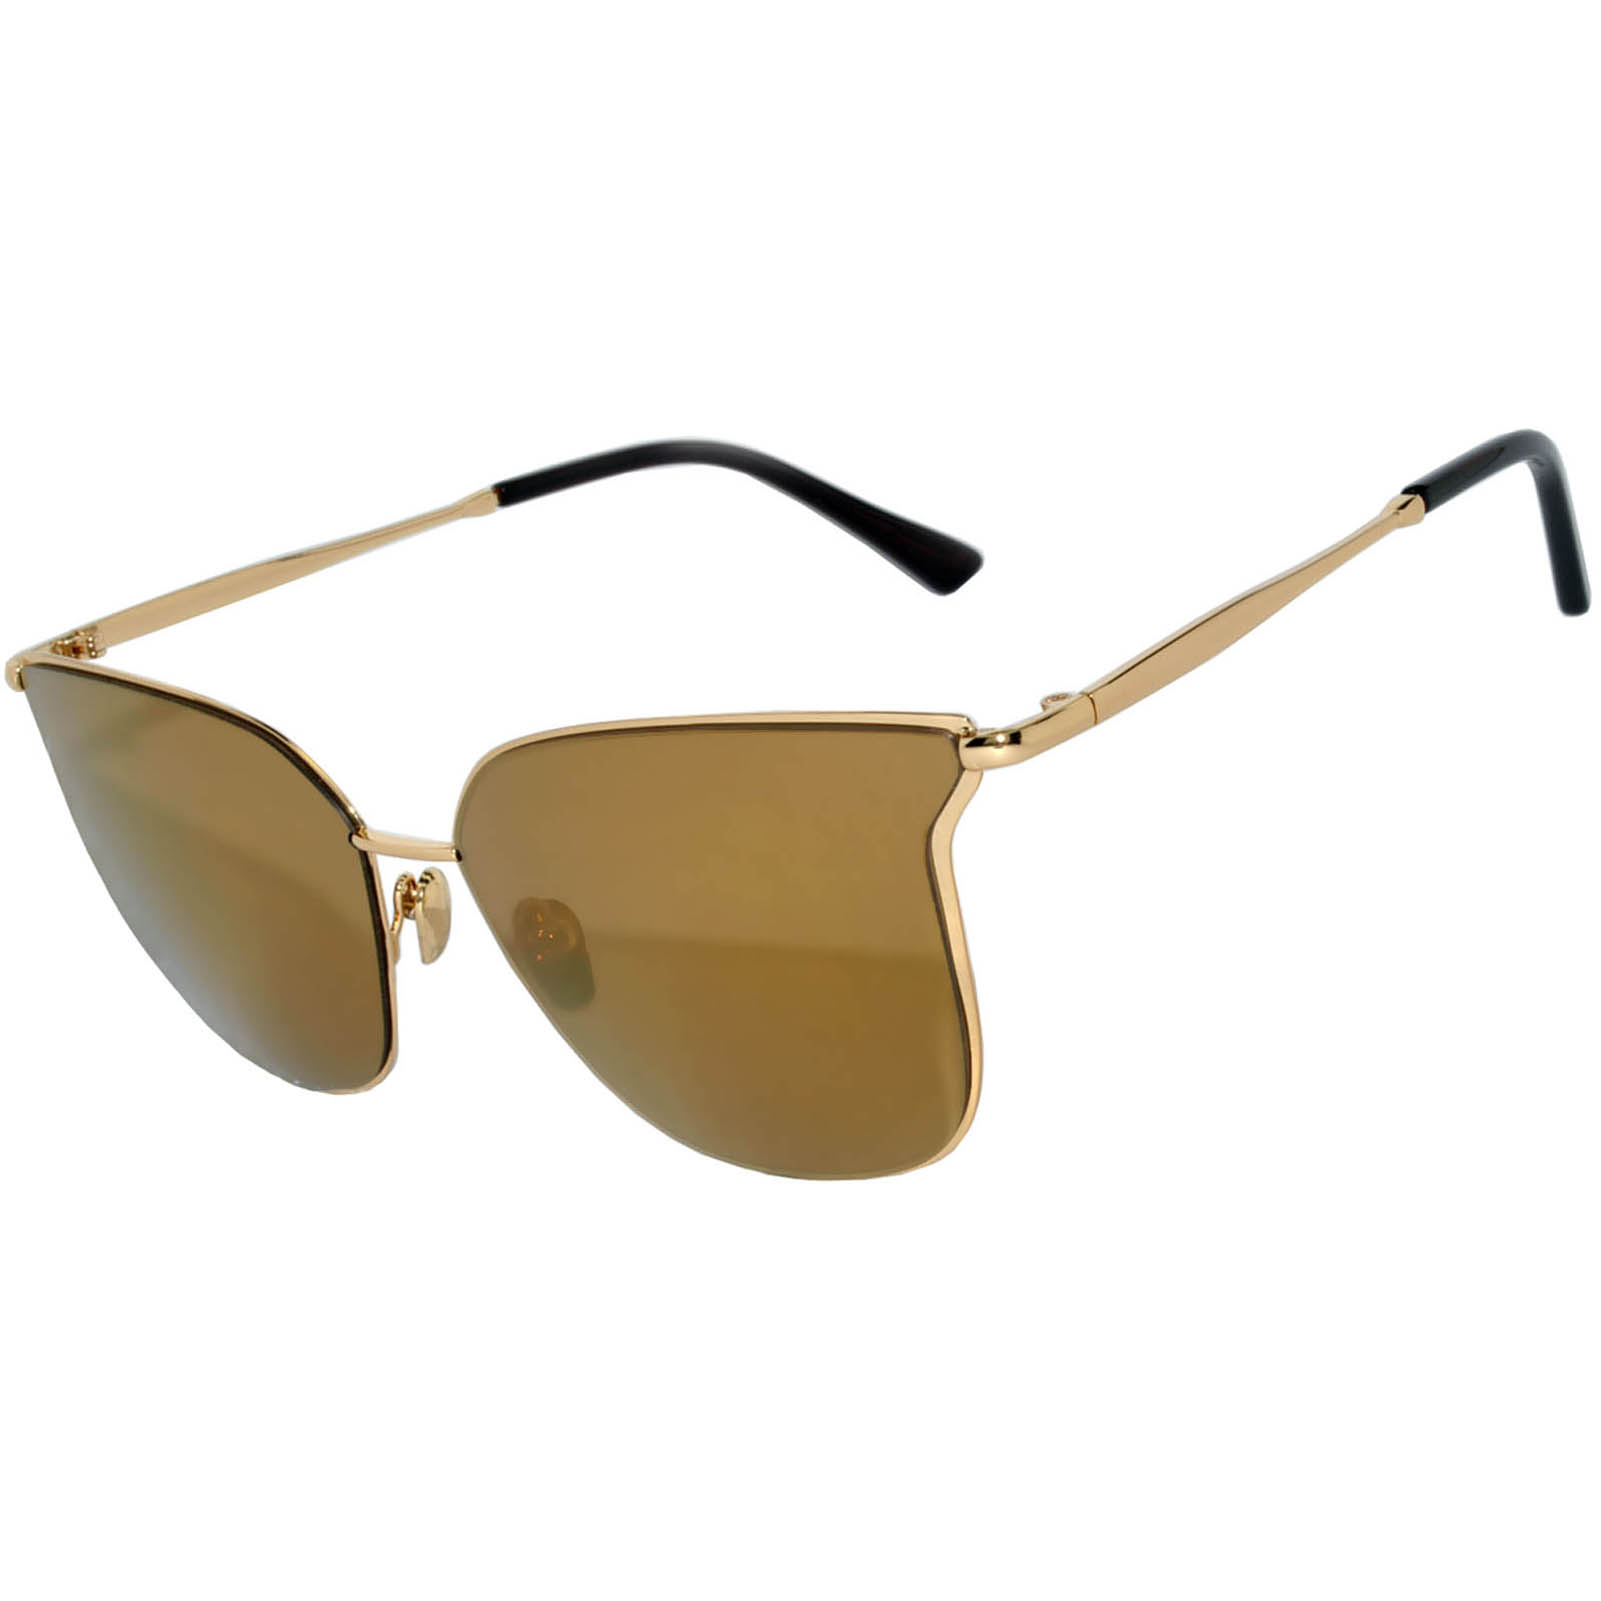 1634a172d22 OWL ® Eyewear Sunglasses 86009 C2 Women s Metal Fashion Gold Frame Brown  Mirror Lens One Pair